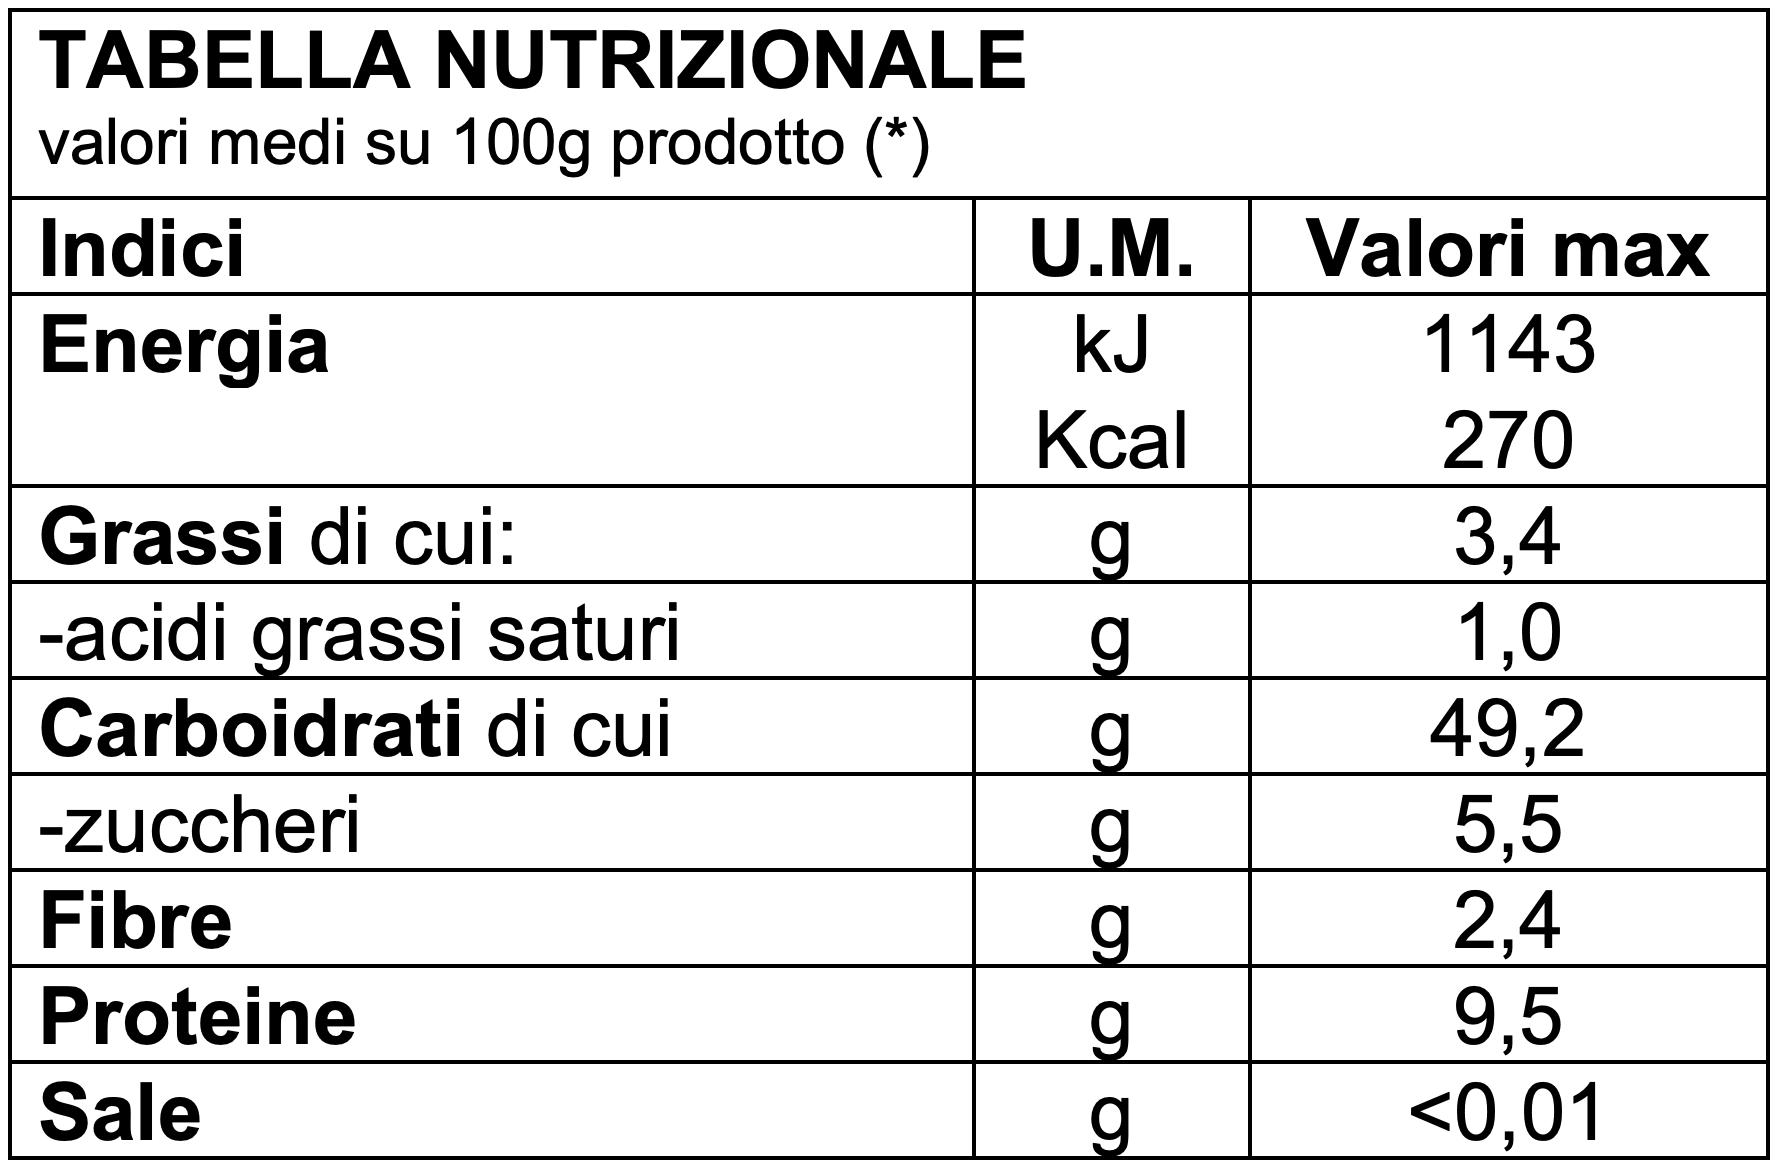 https://www.panem.it/wp-content/uploads/2019/12/tabella-nutrizionale-tenero-tradizionale-senza-sale.png